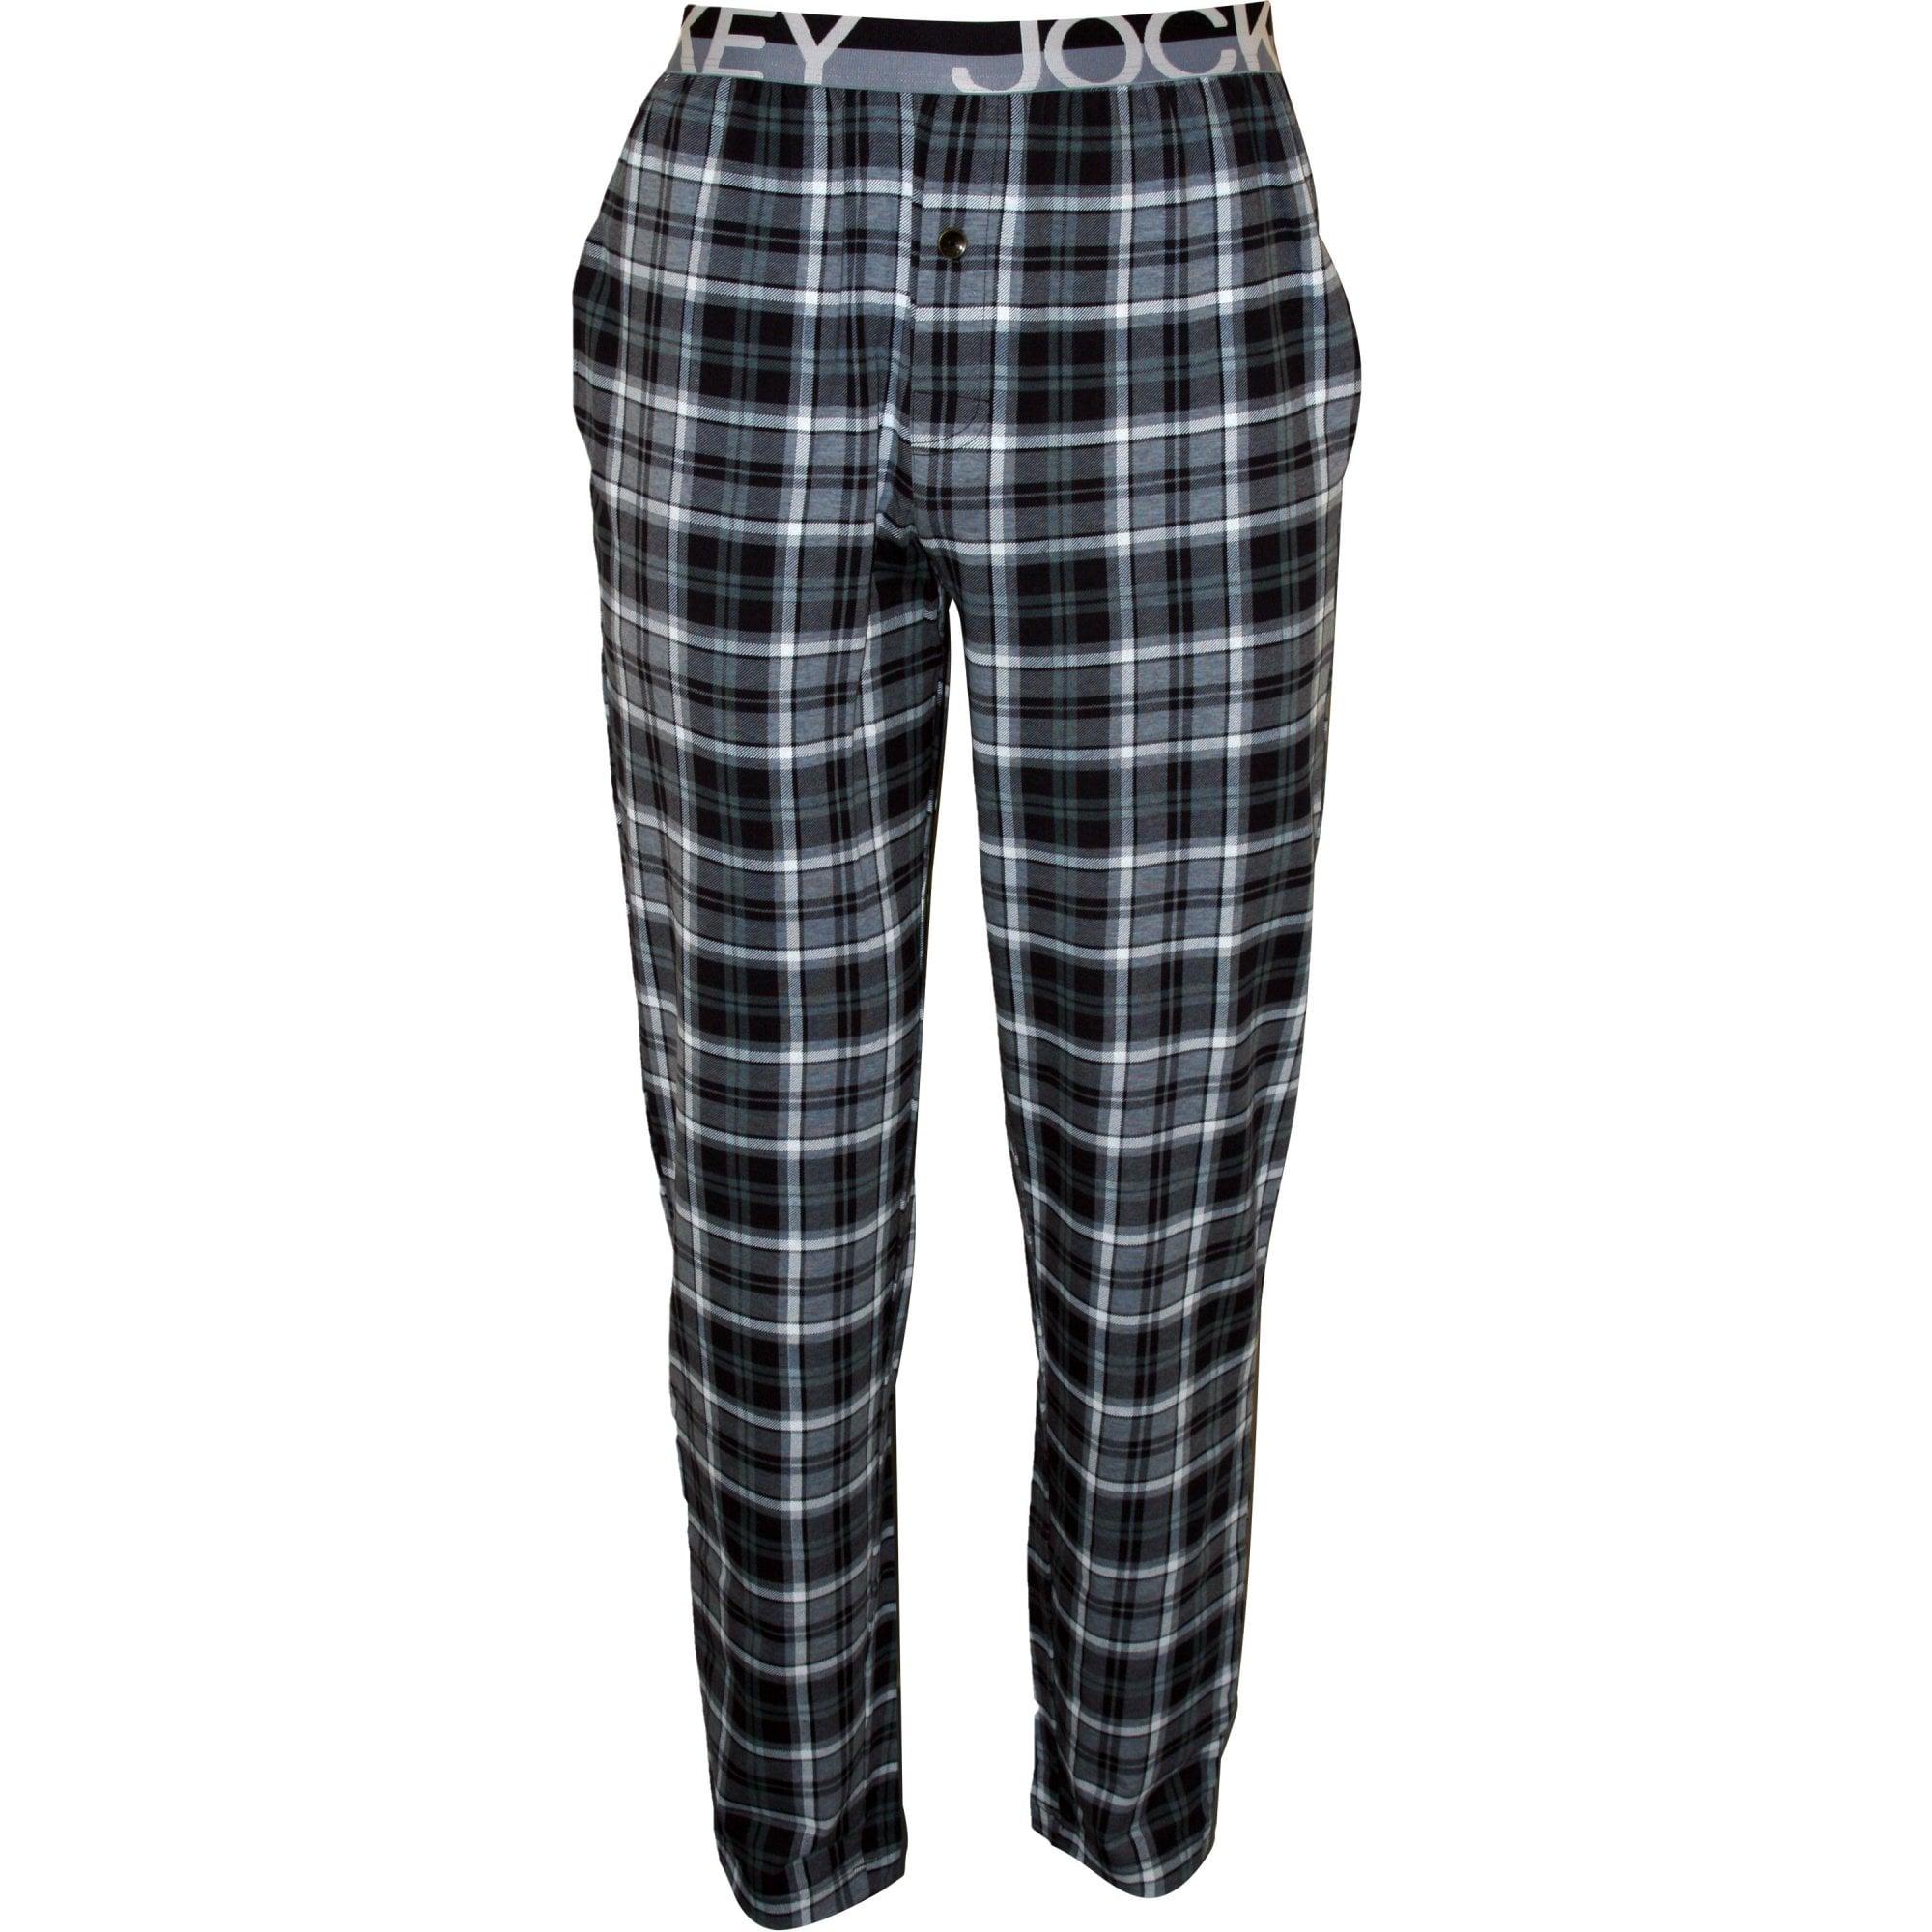 Lacoste Men/'s Cotton Modal Sleep Pant Free Shipping